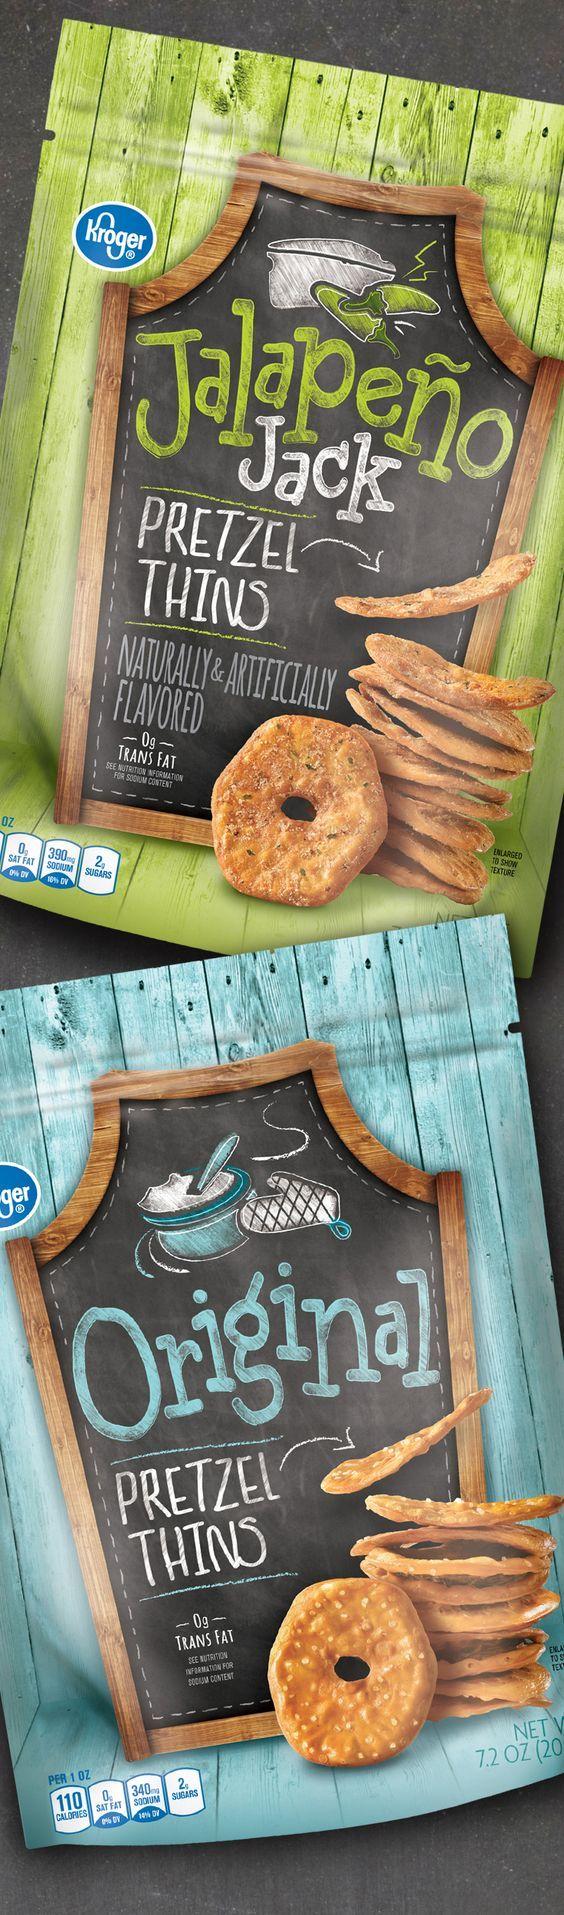 Pretzel Thins - Packaging designed by Design Resource Center http://www.drcchicago.com/: